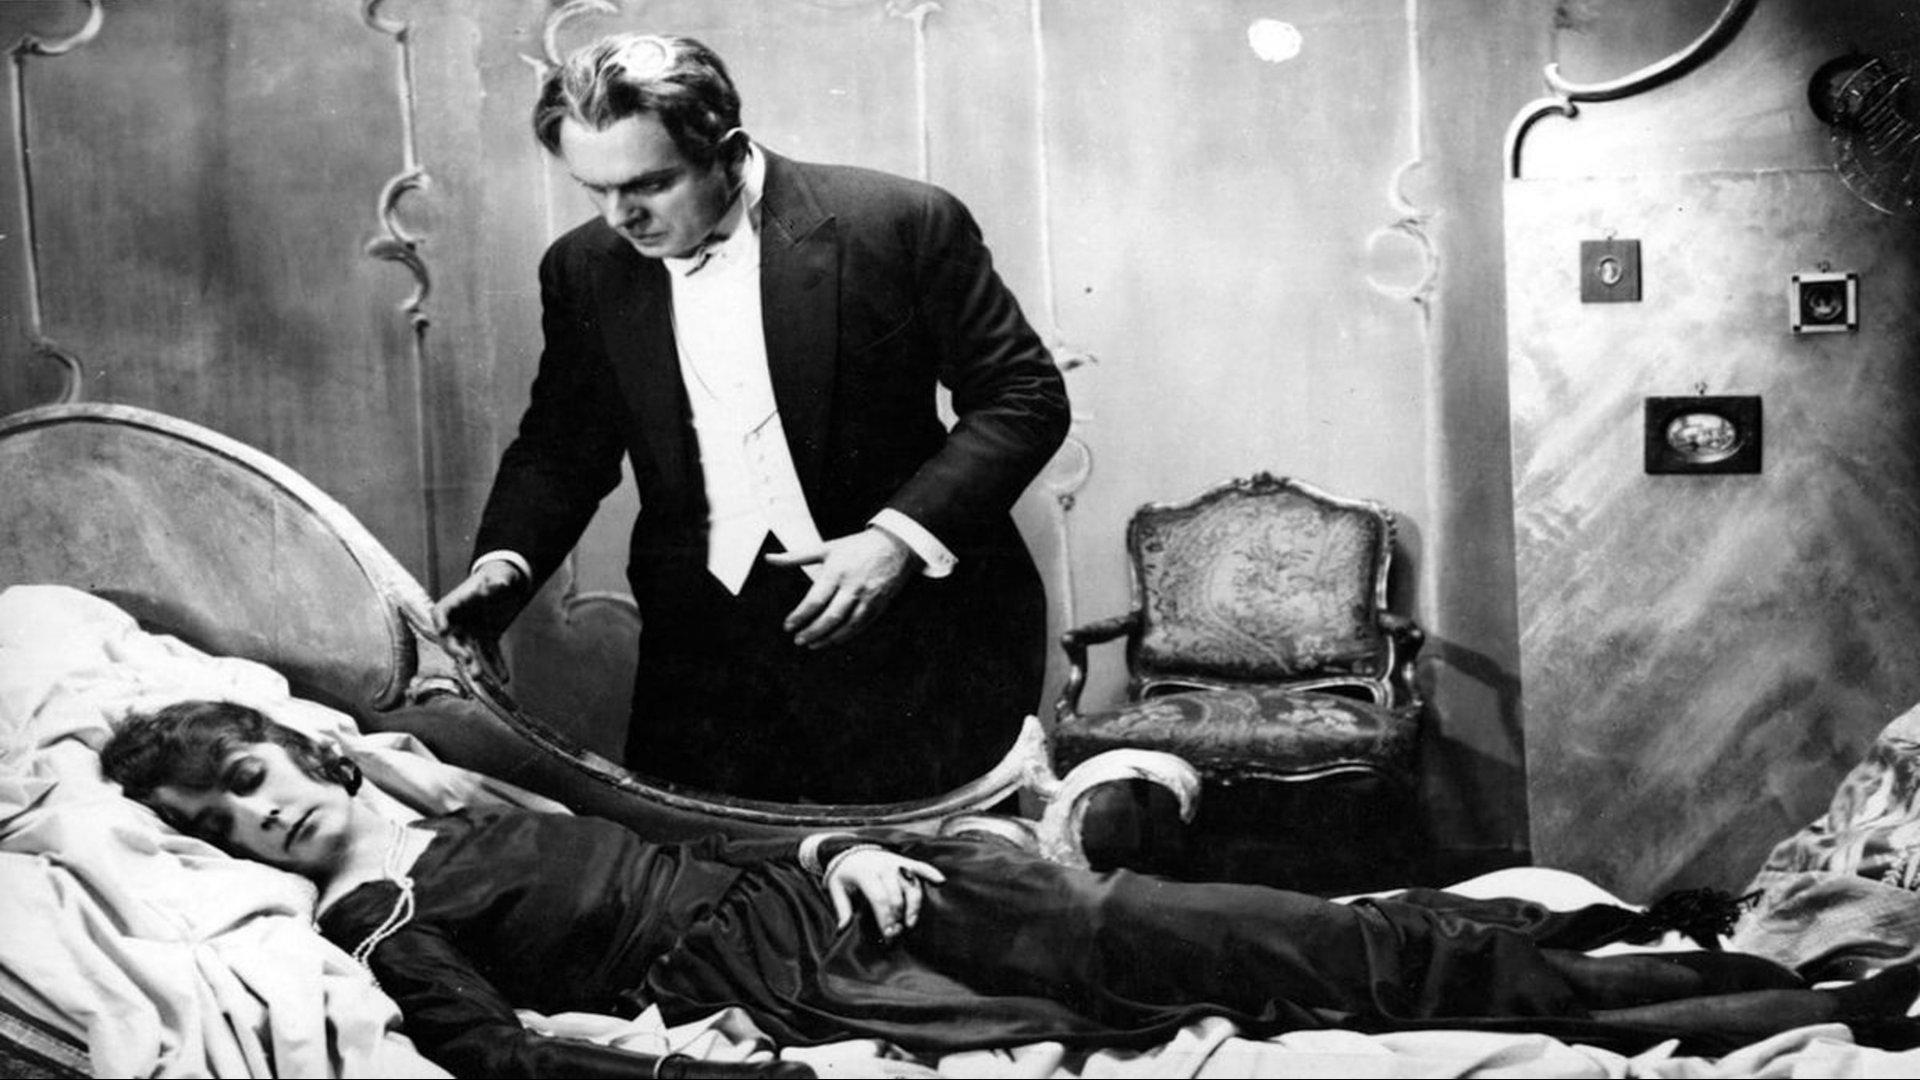 Doktor Mabuse, dobrodruhONLINE